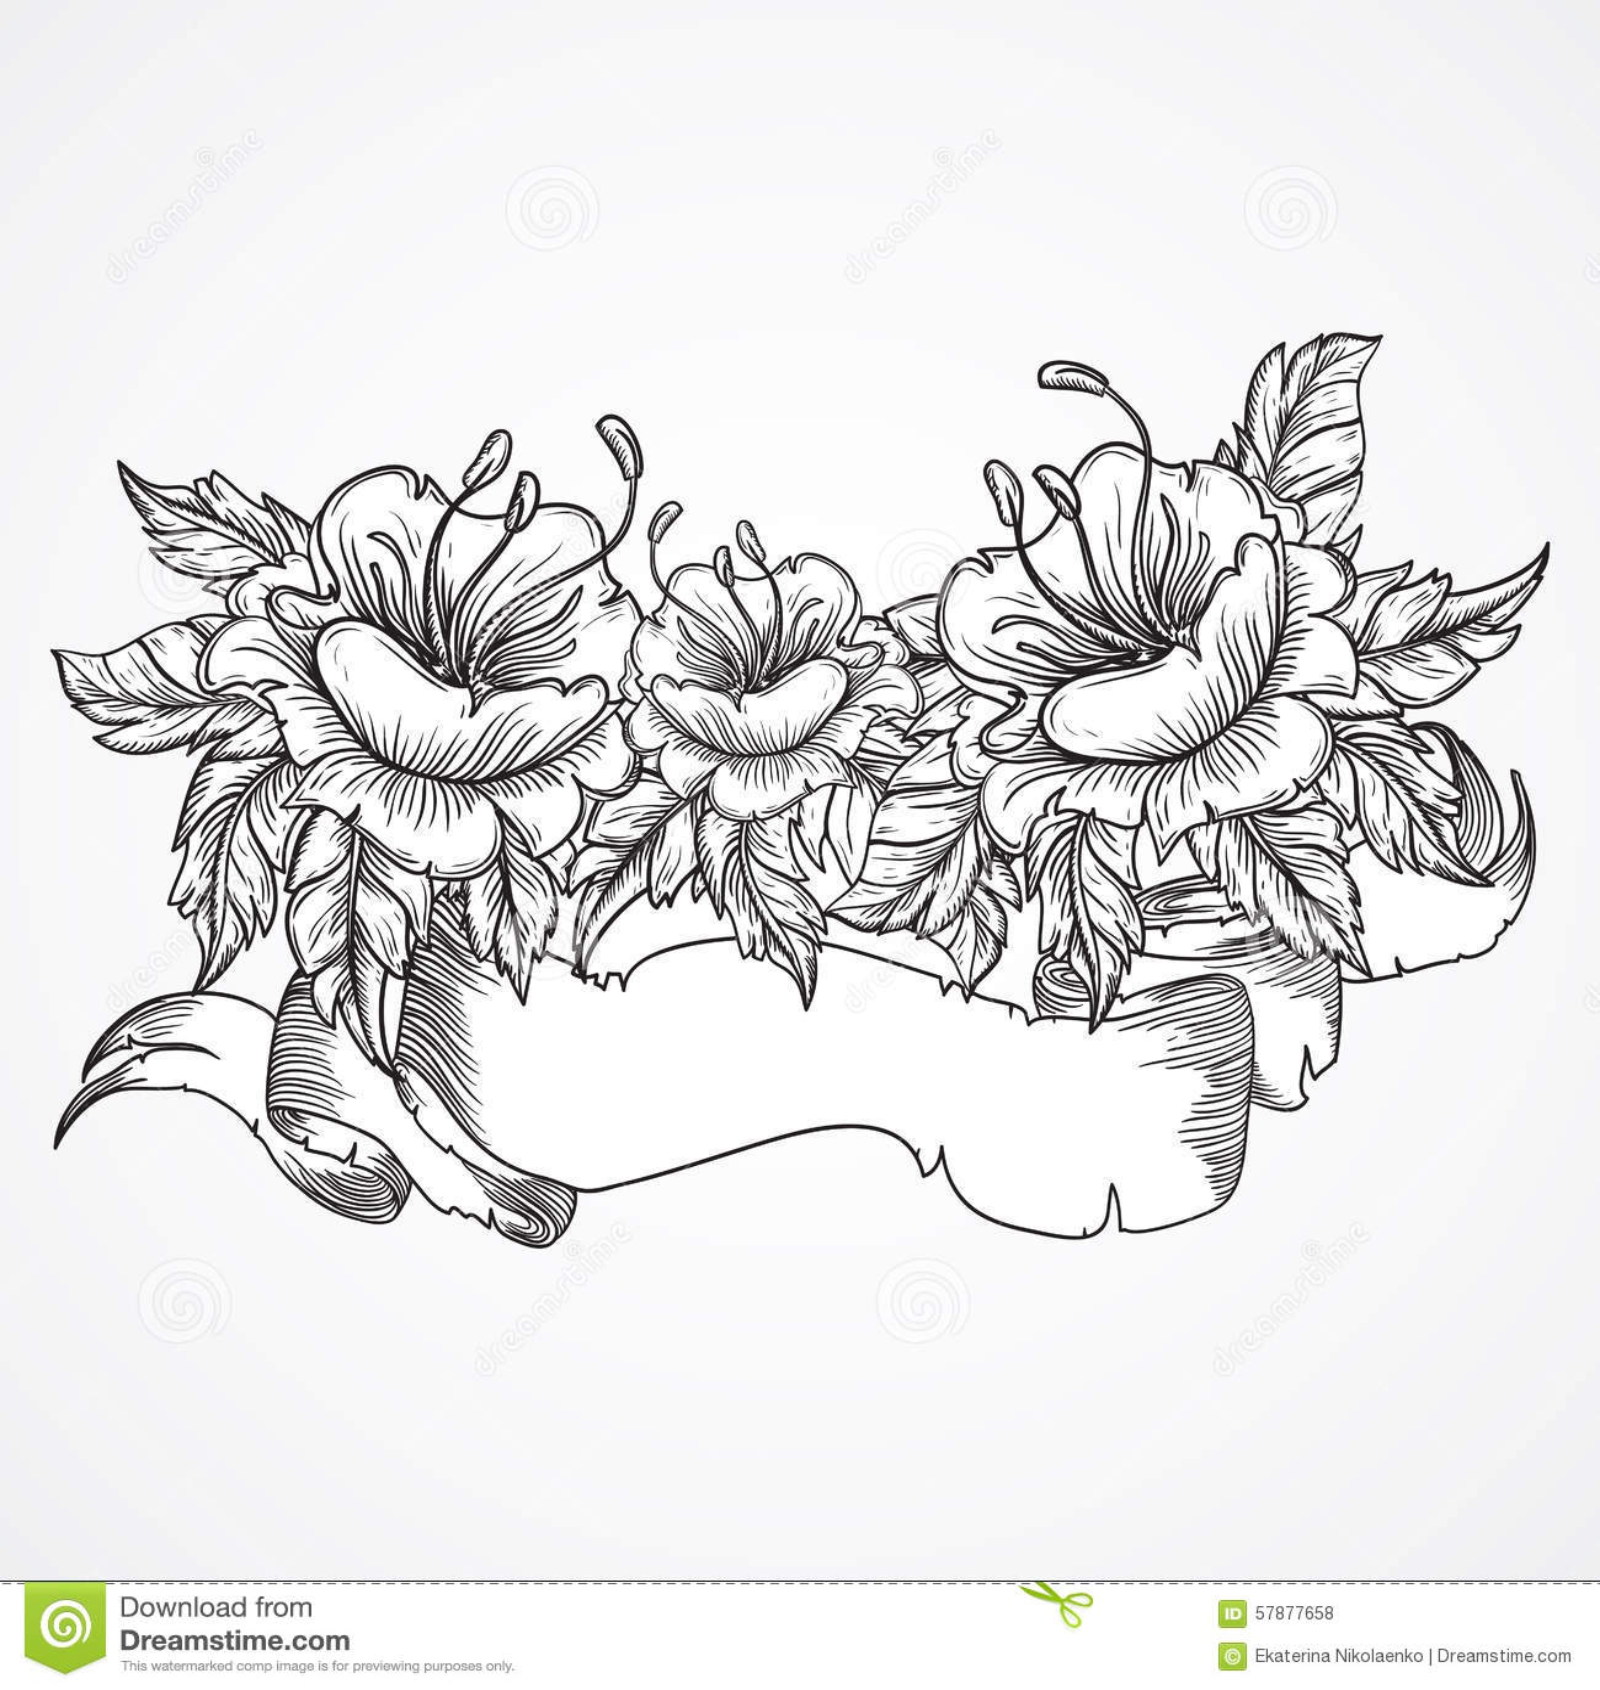 Vintage Floral Highly Detailed Hand Drawn Bouquet Of ...  Vintage Floral ...